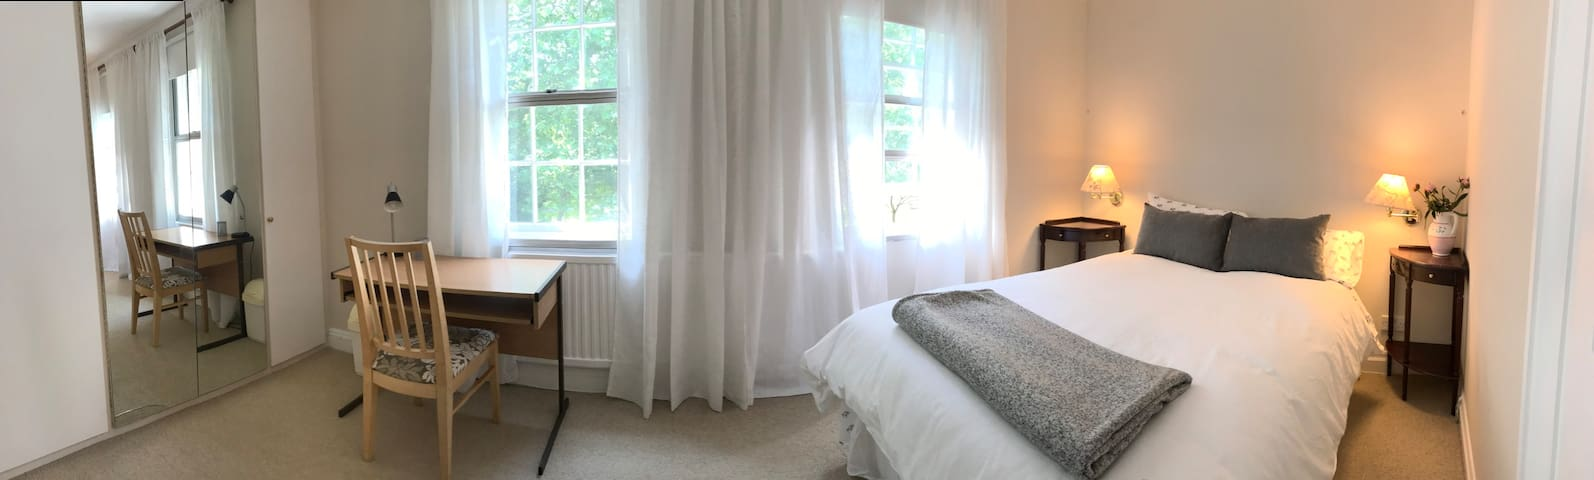 Bedroom 2 — Super views of the gardens